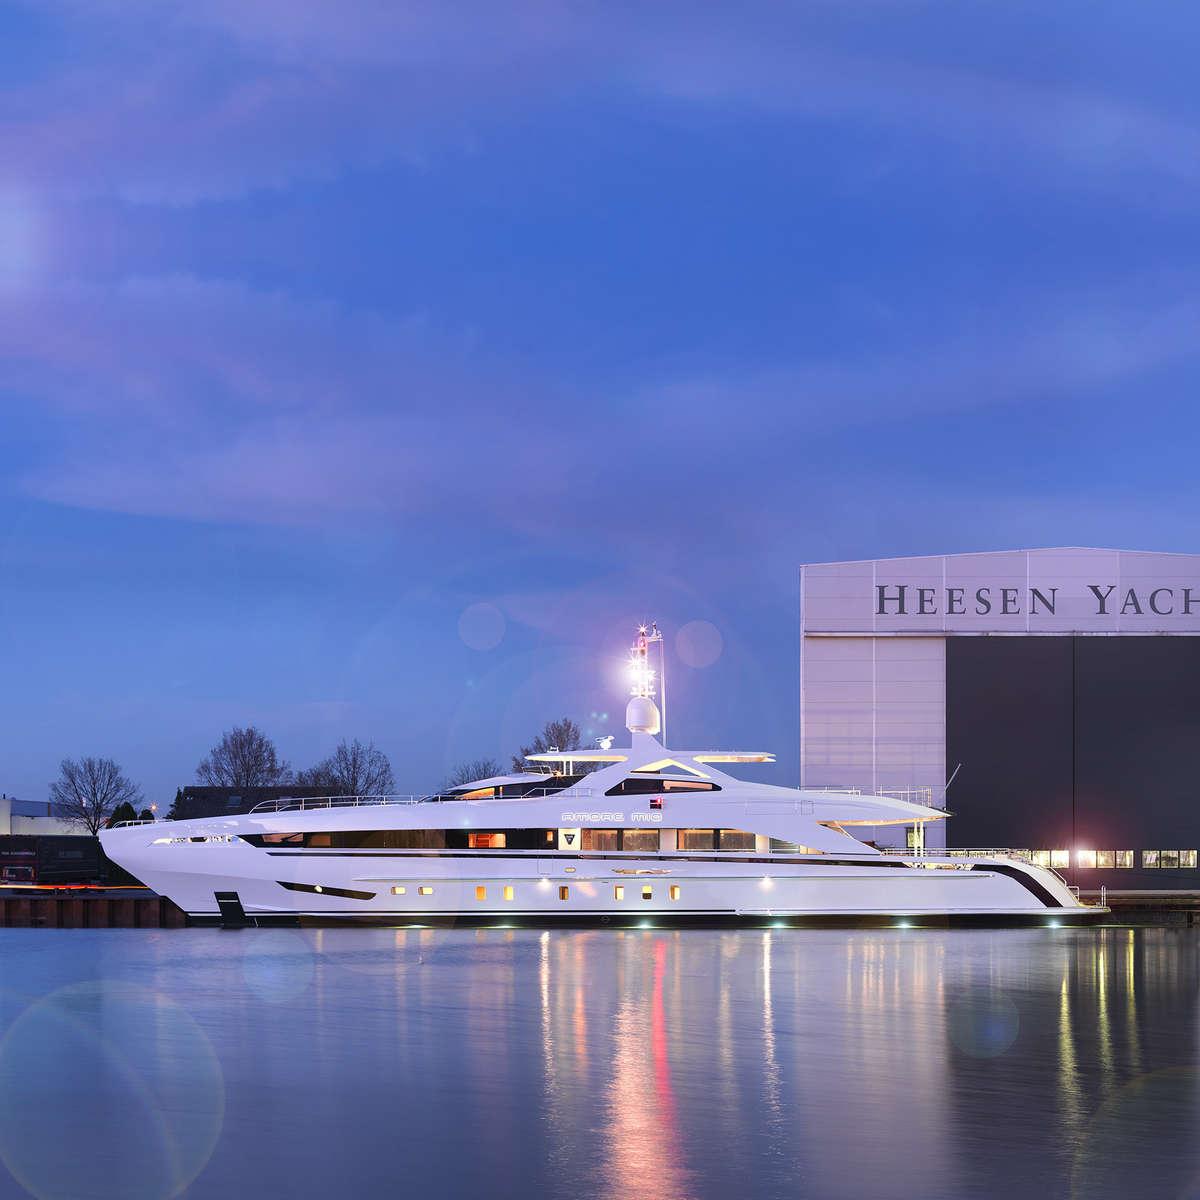 Heesen Yachts HY17145 Amore Mio